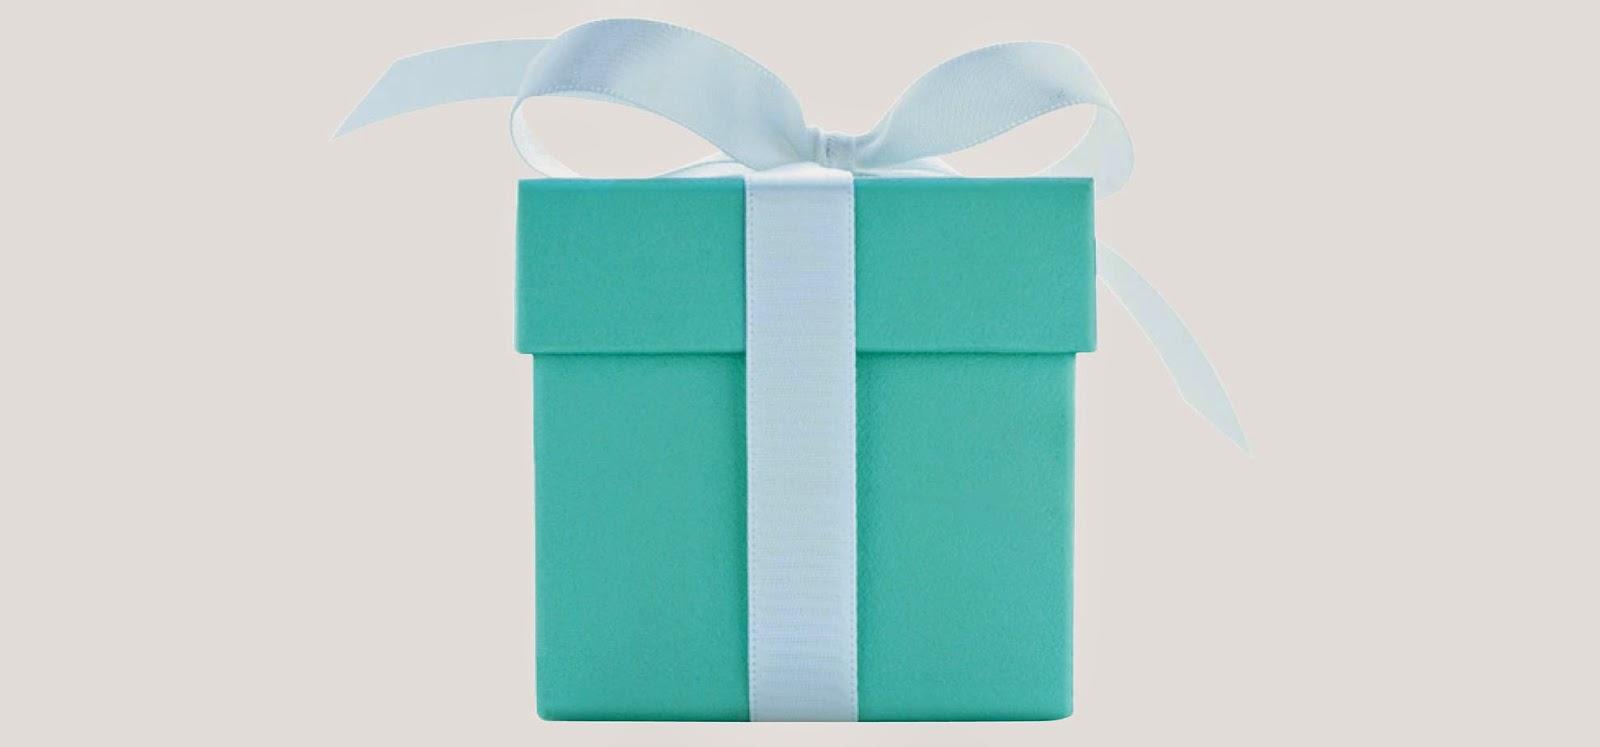 Free Tiffany Box Cliparts, Download Free Clip Art, Free Clip.